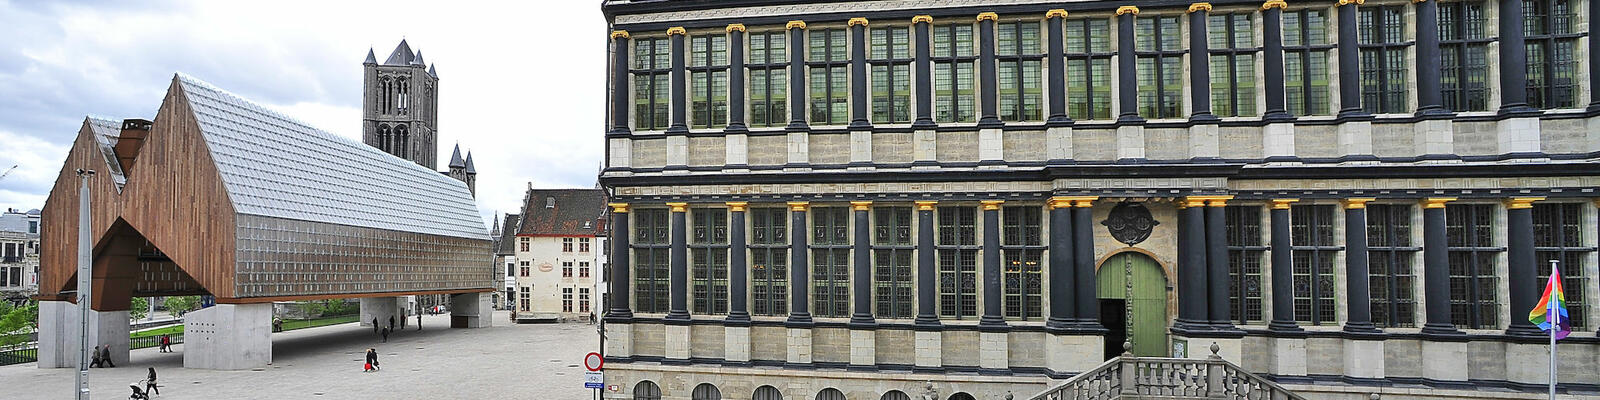 295714-stadhuis bis-bcc0db-01ef17-original-1542103052.jpg